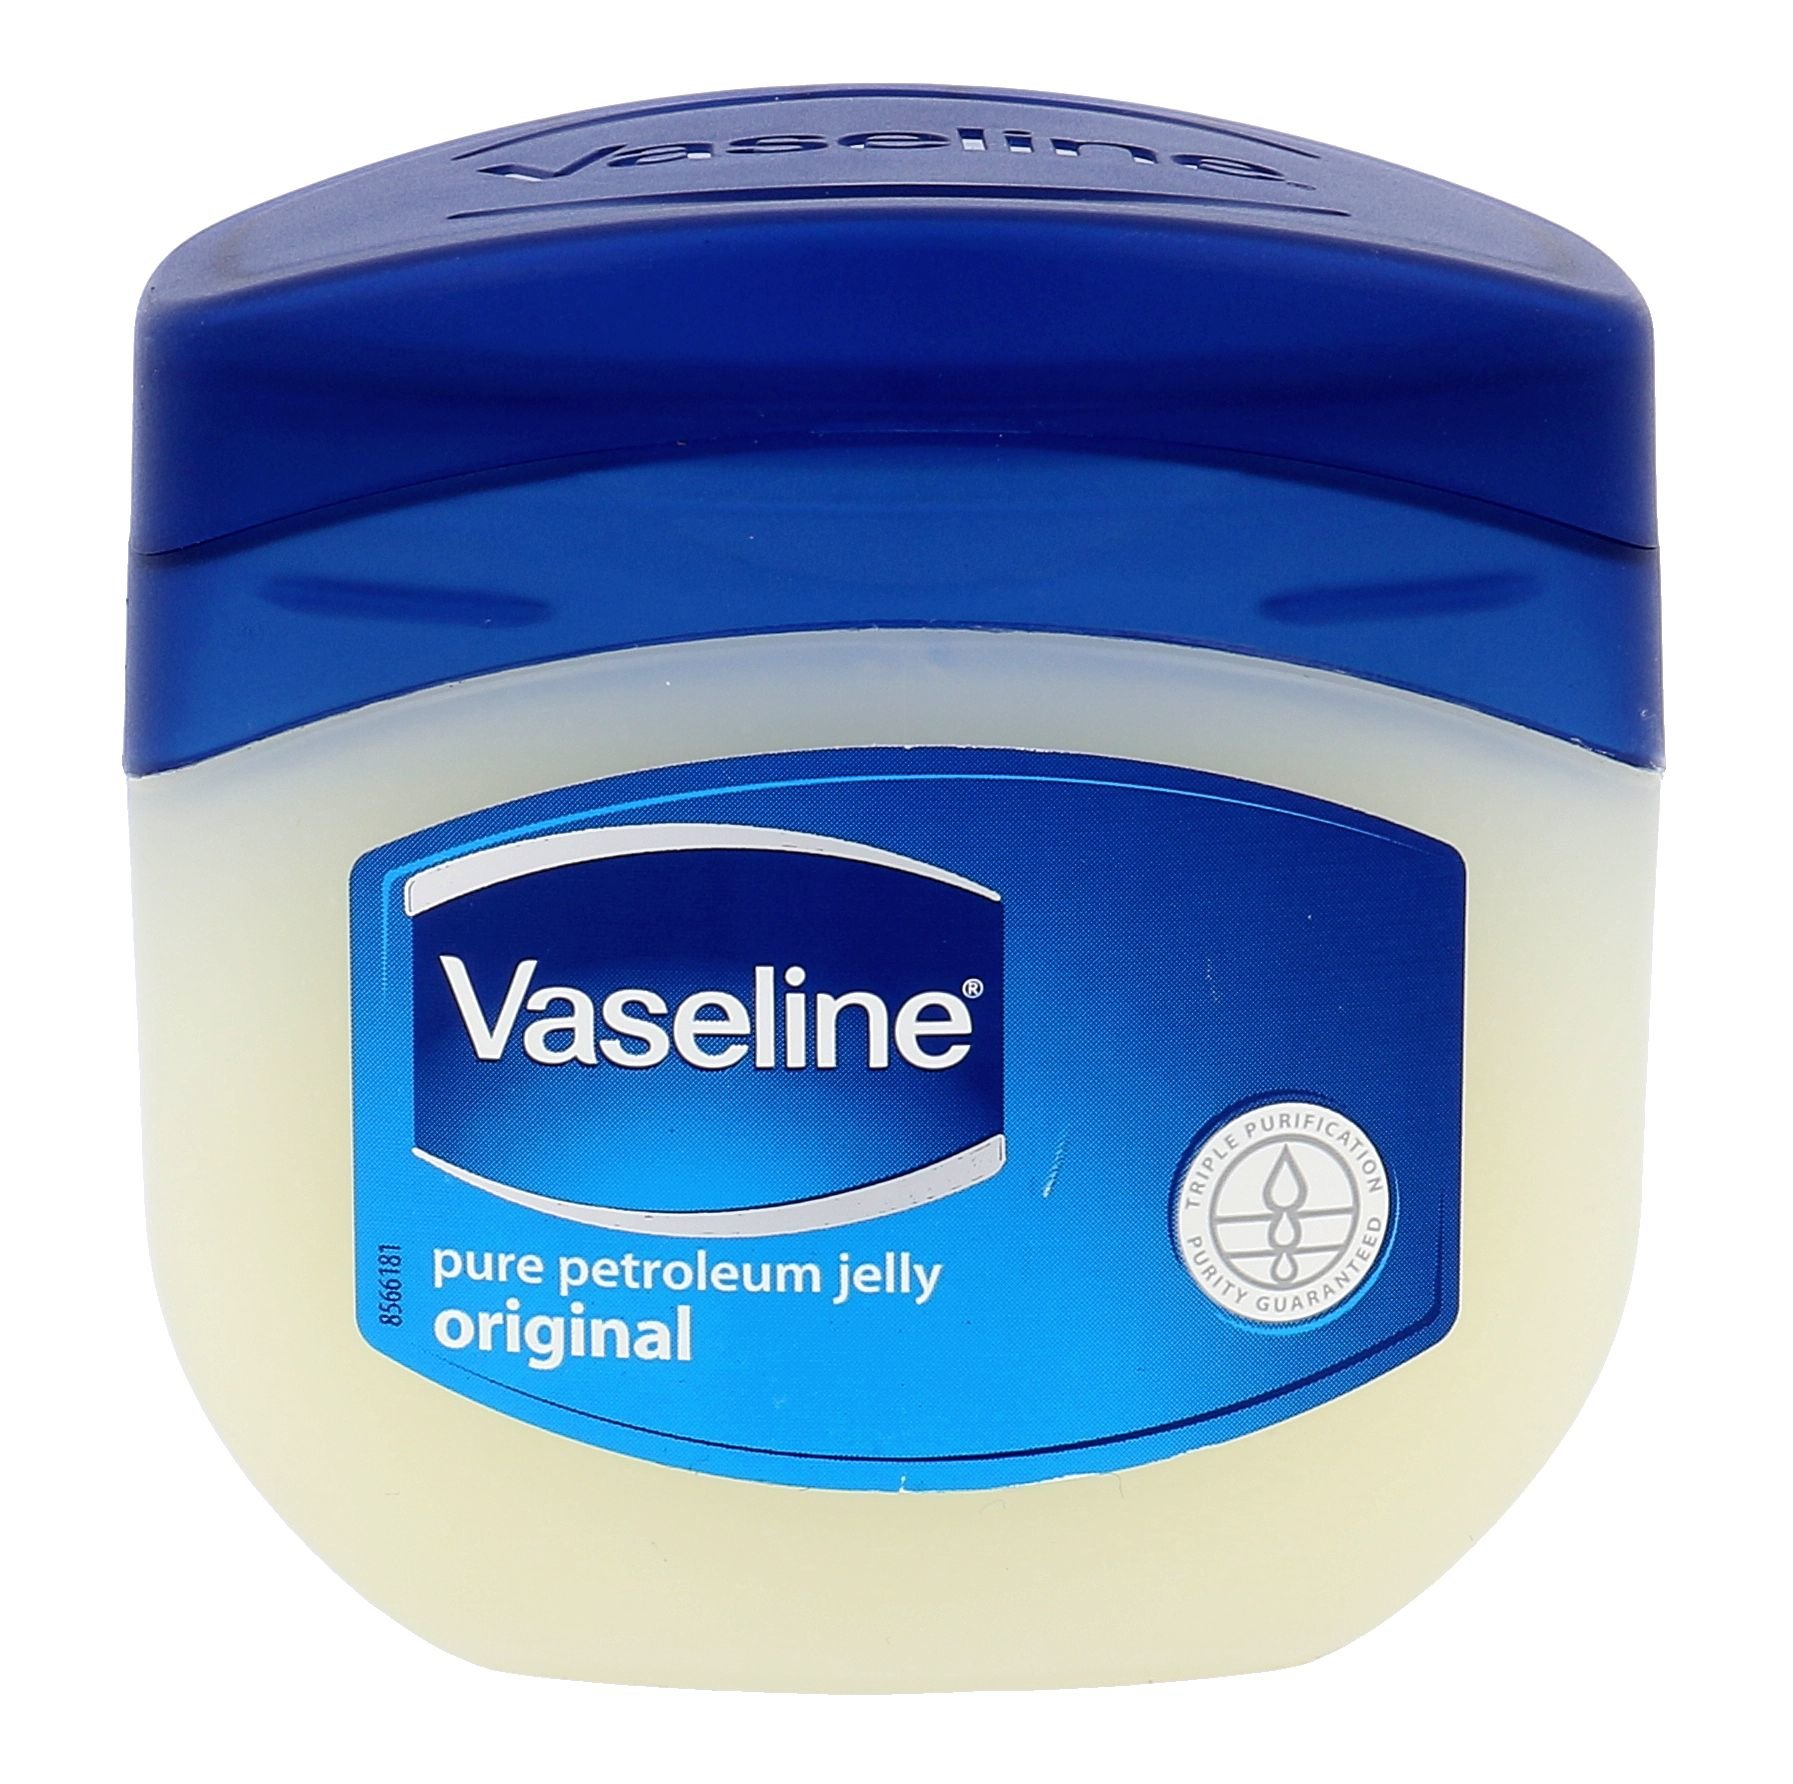 Vaseline Petroleum Jelly Original Cosmetic 100ml